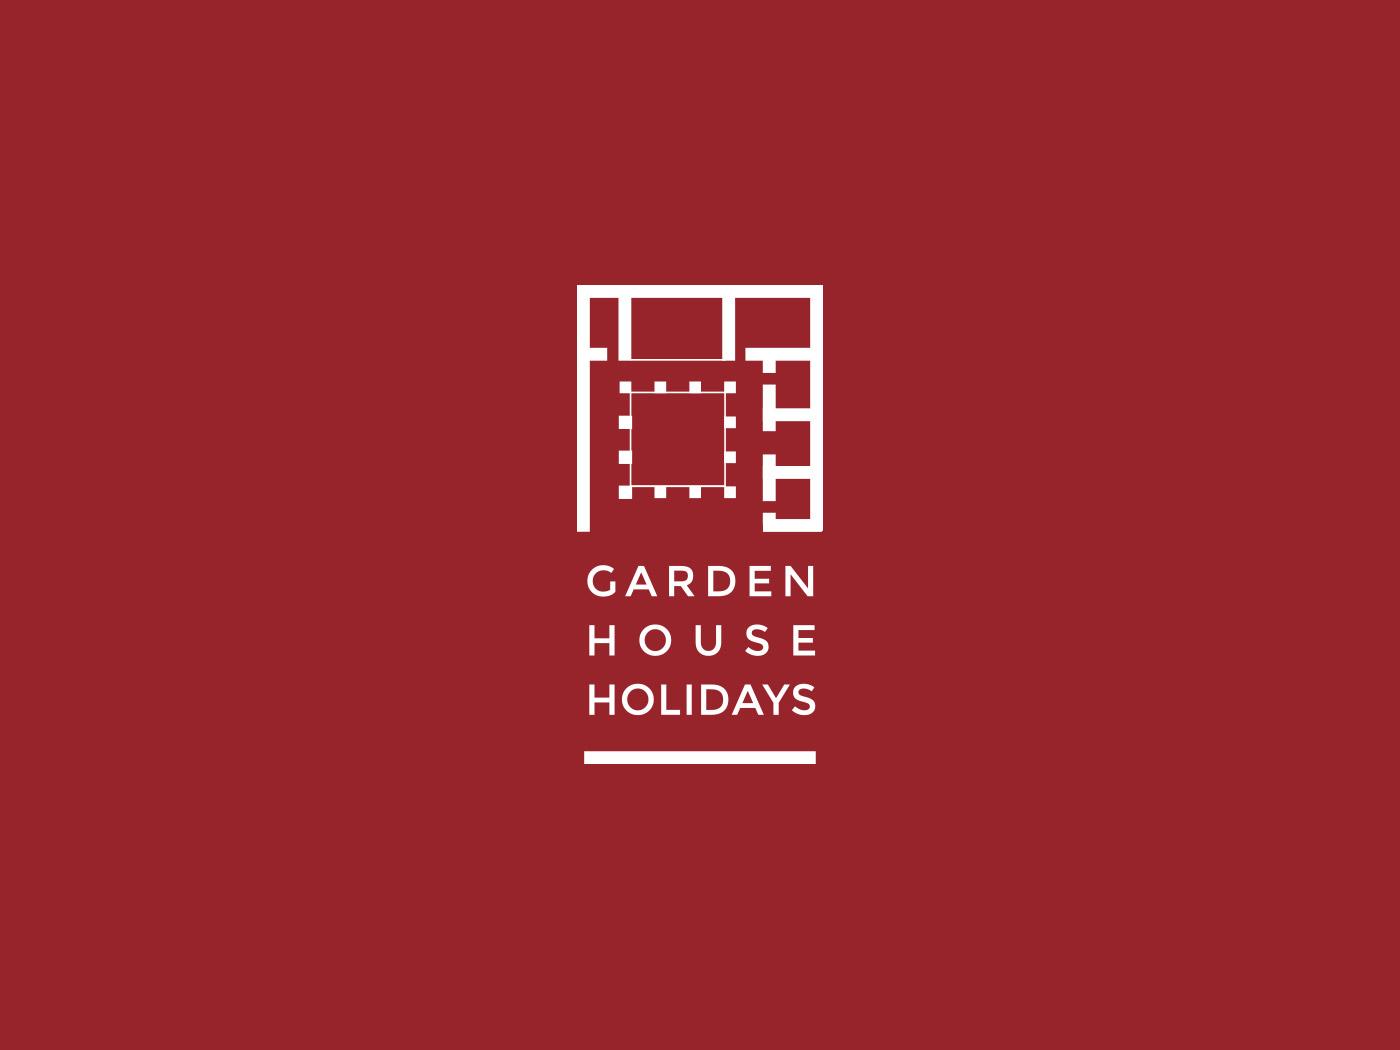 Garden house Holidays primary logo